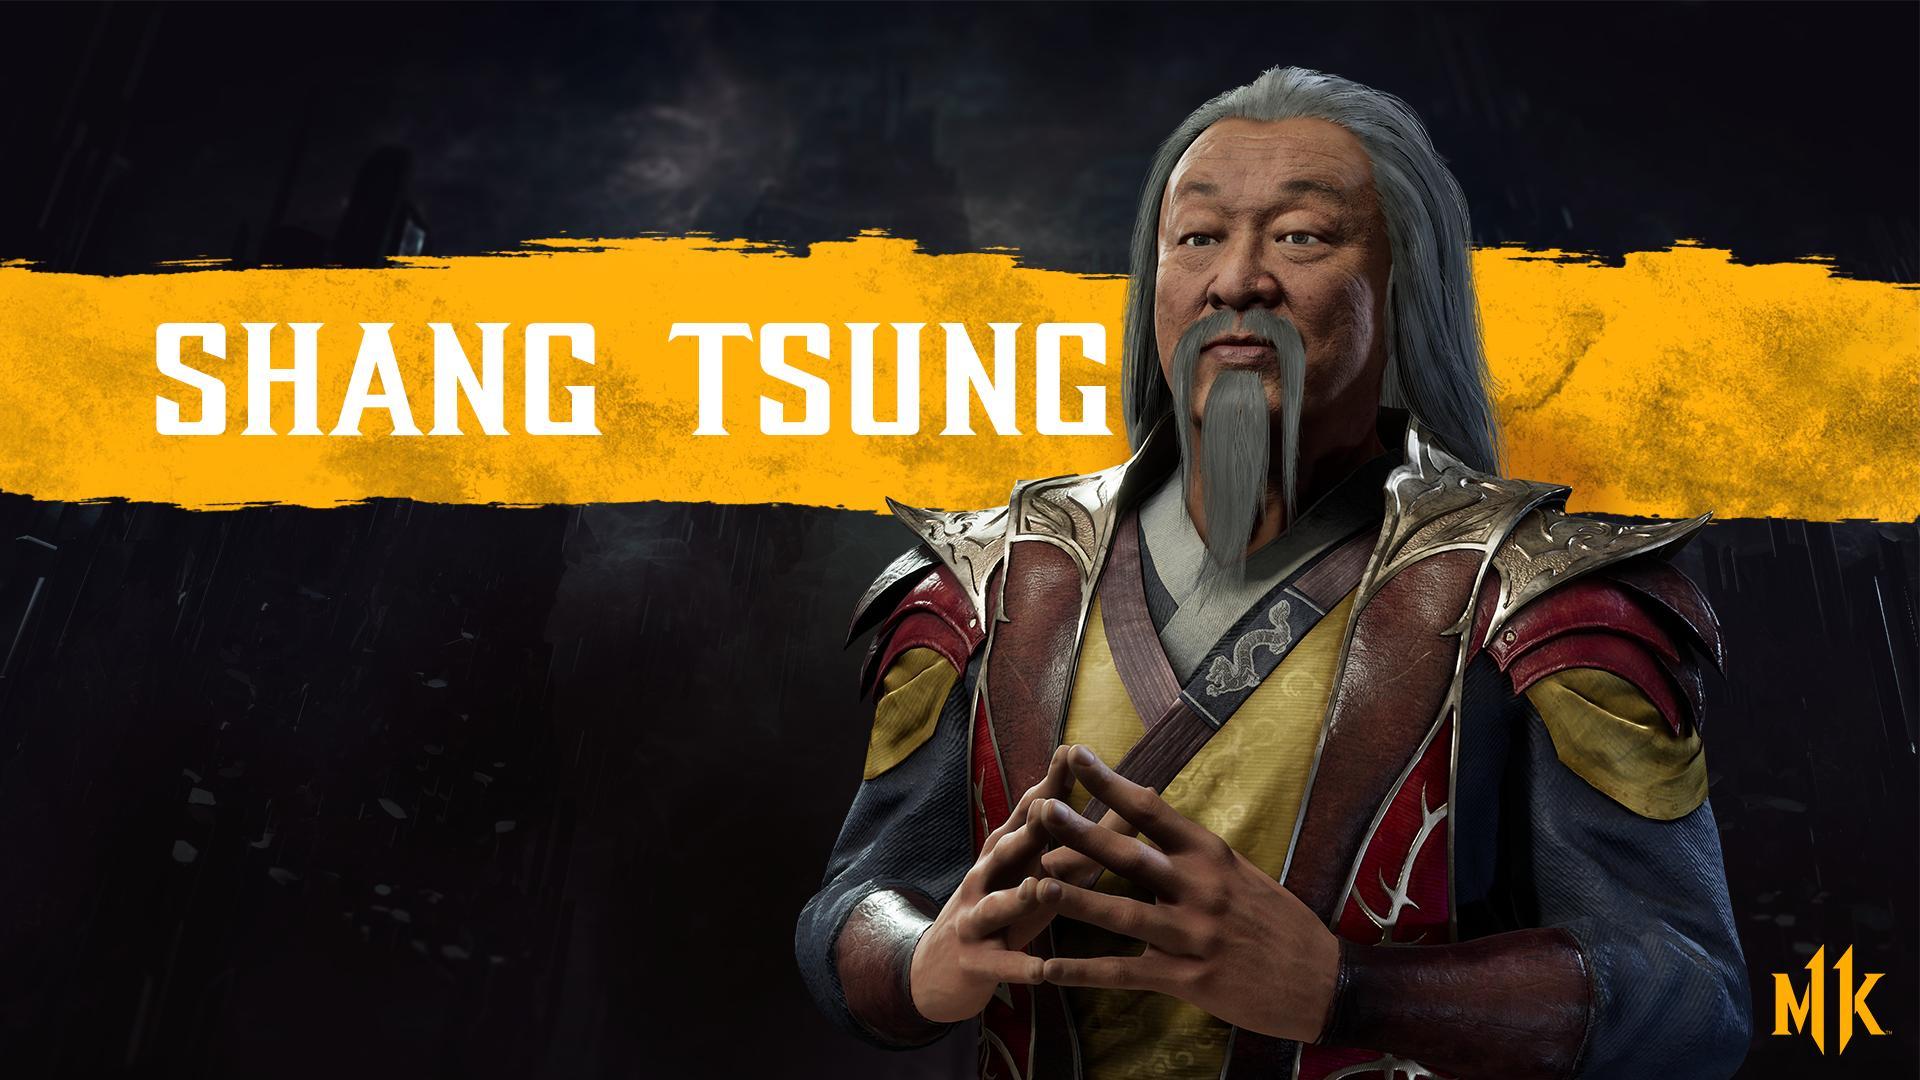 Mortal Kombat 11 - Shang Tsung será un personaje jugable adicional